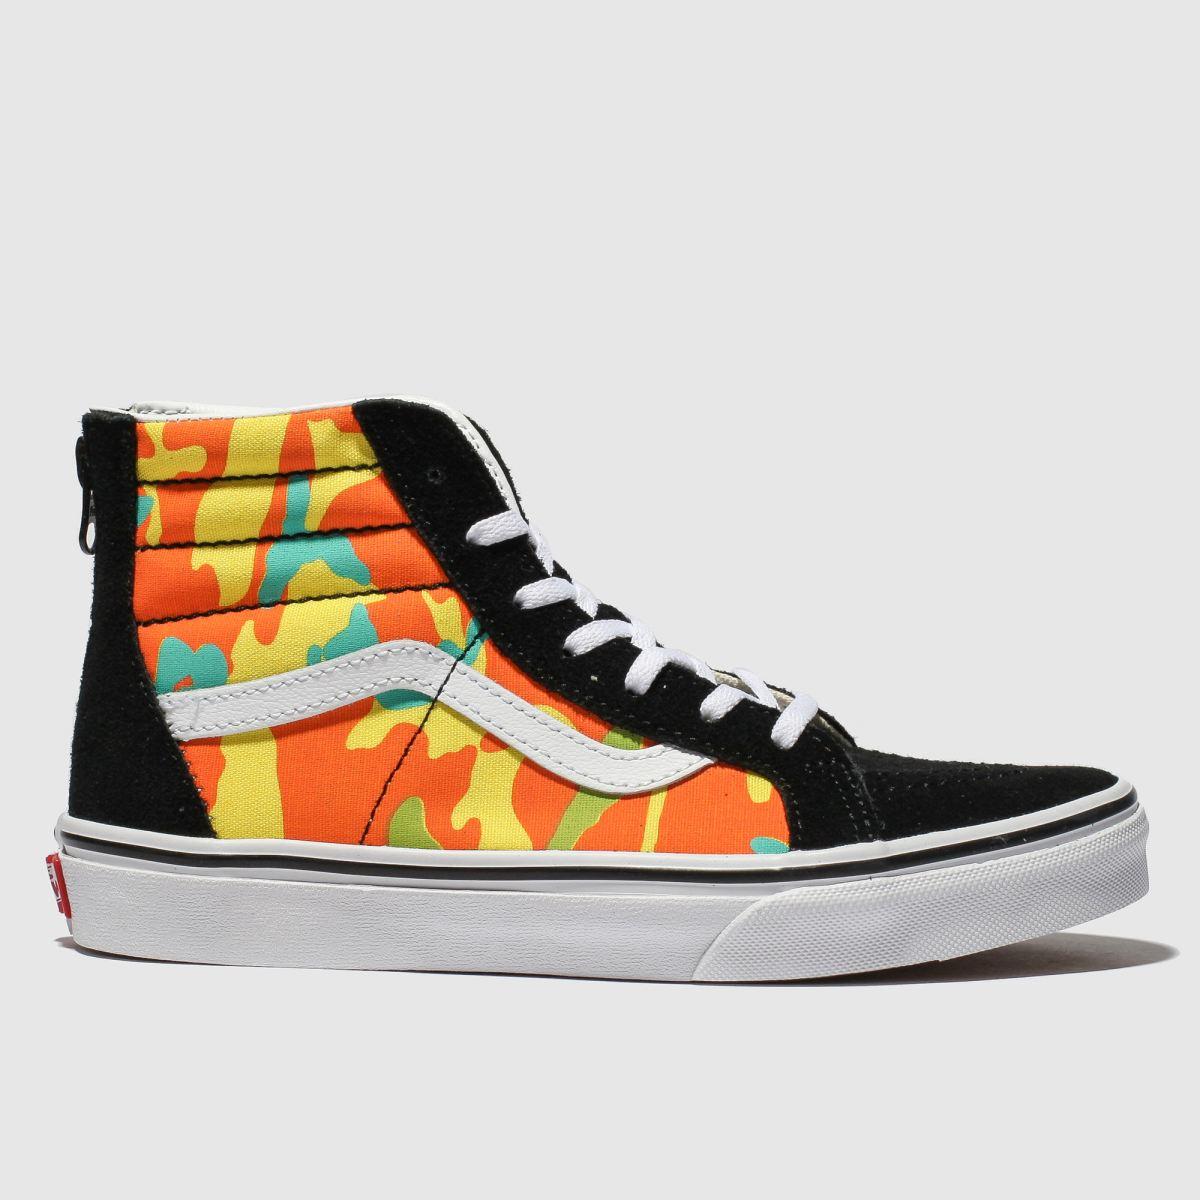 c1444edb486b81 Vans Black   Orange Sk8-hi Zip Pop Camo Trainers Youth - Schuh at Westquay  - Shop Online